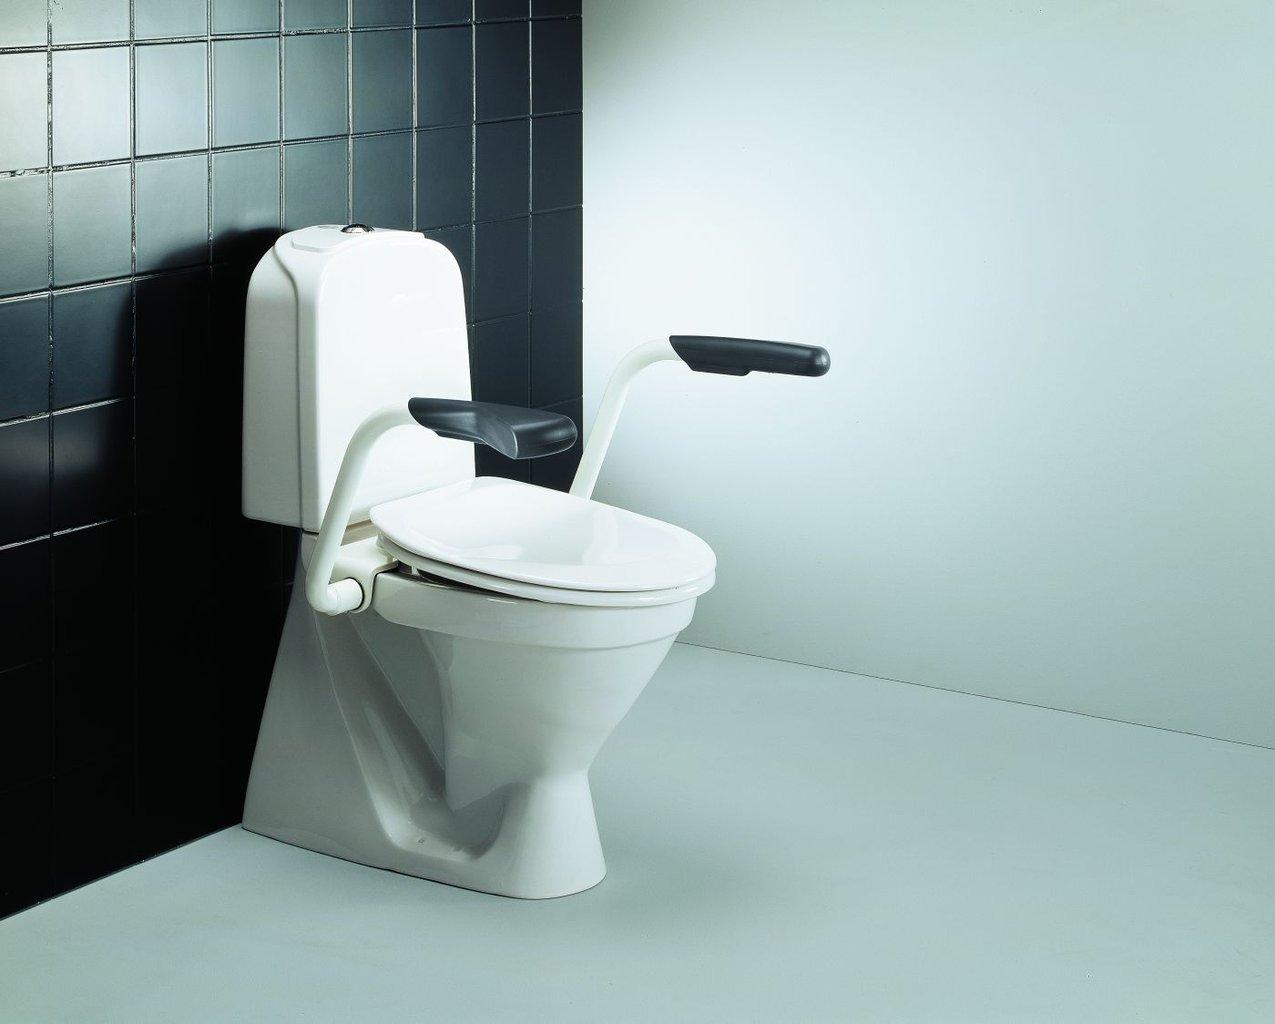 pressalit care value r1170000 value armst tze zur montage f r toilette inkl dania wc sitz. Black Bedroom Furniture Sets. Home Design Ideas